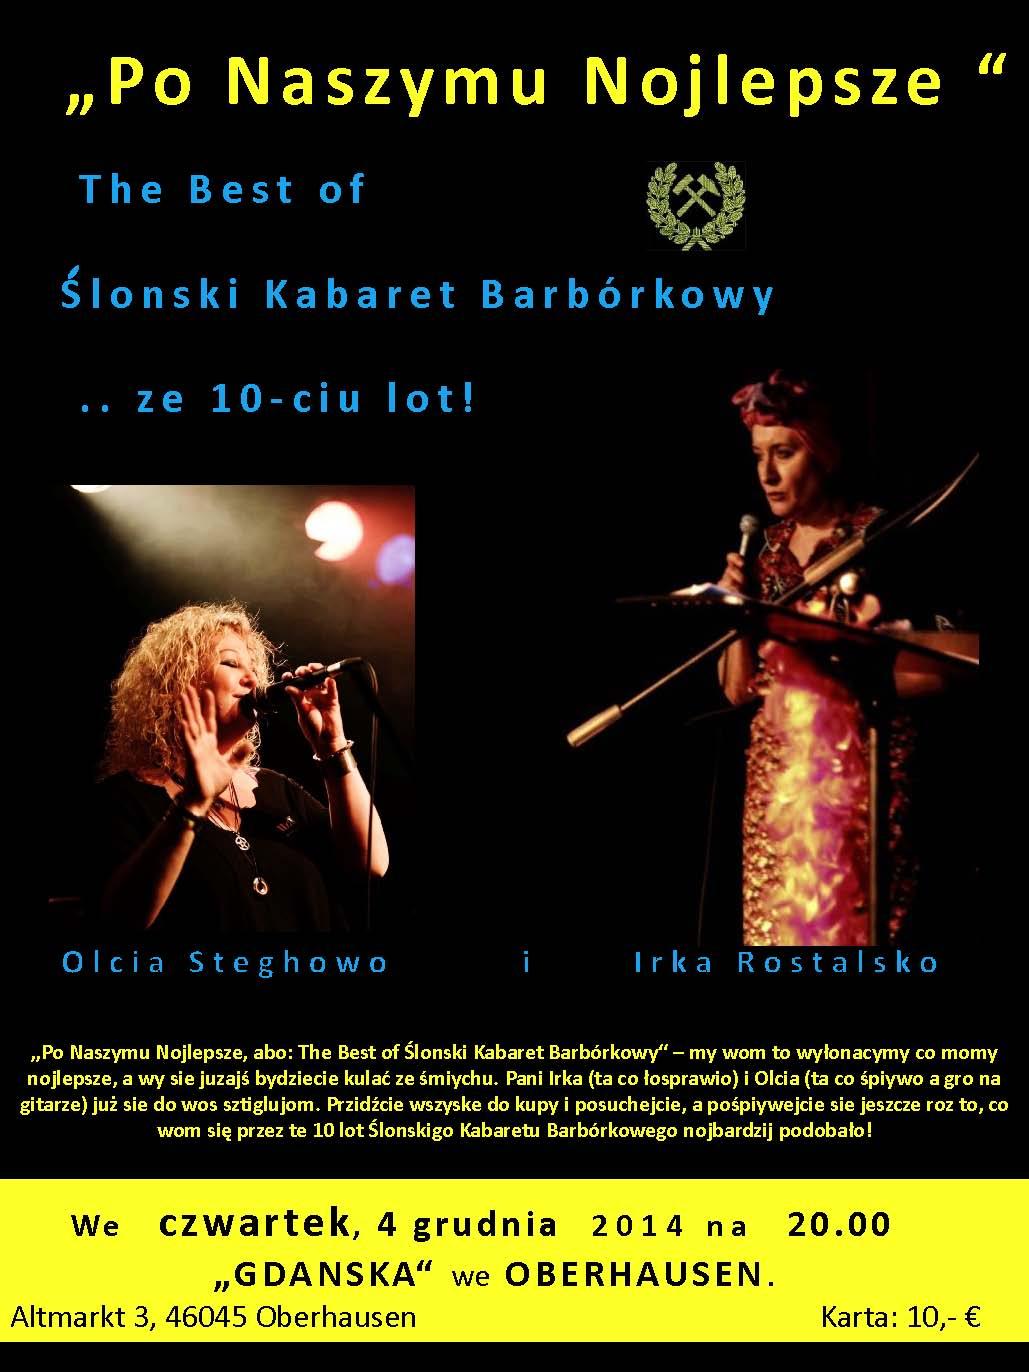 Slonski_Kabaret_Barborkowy04.12.2014